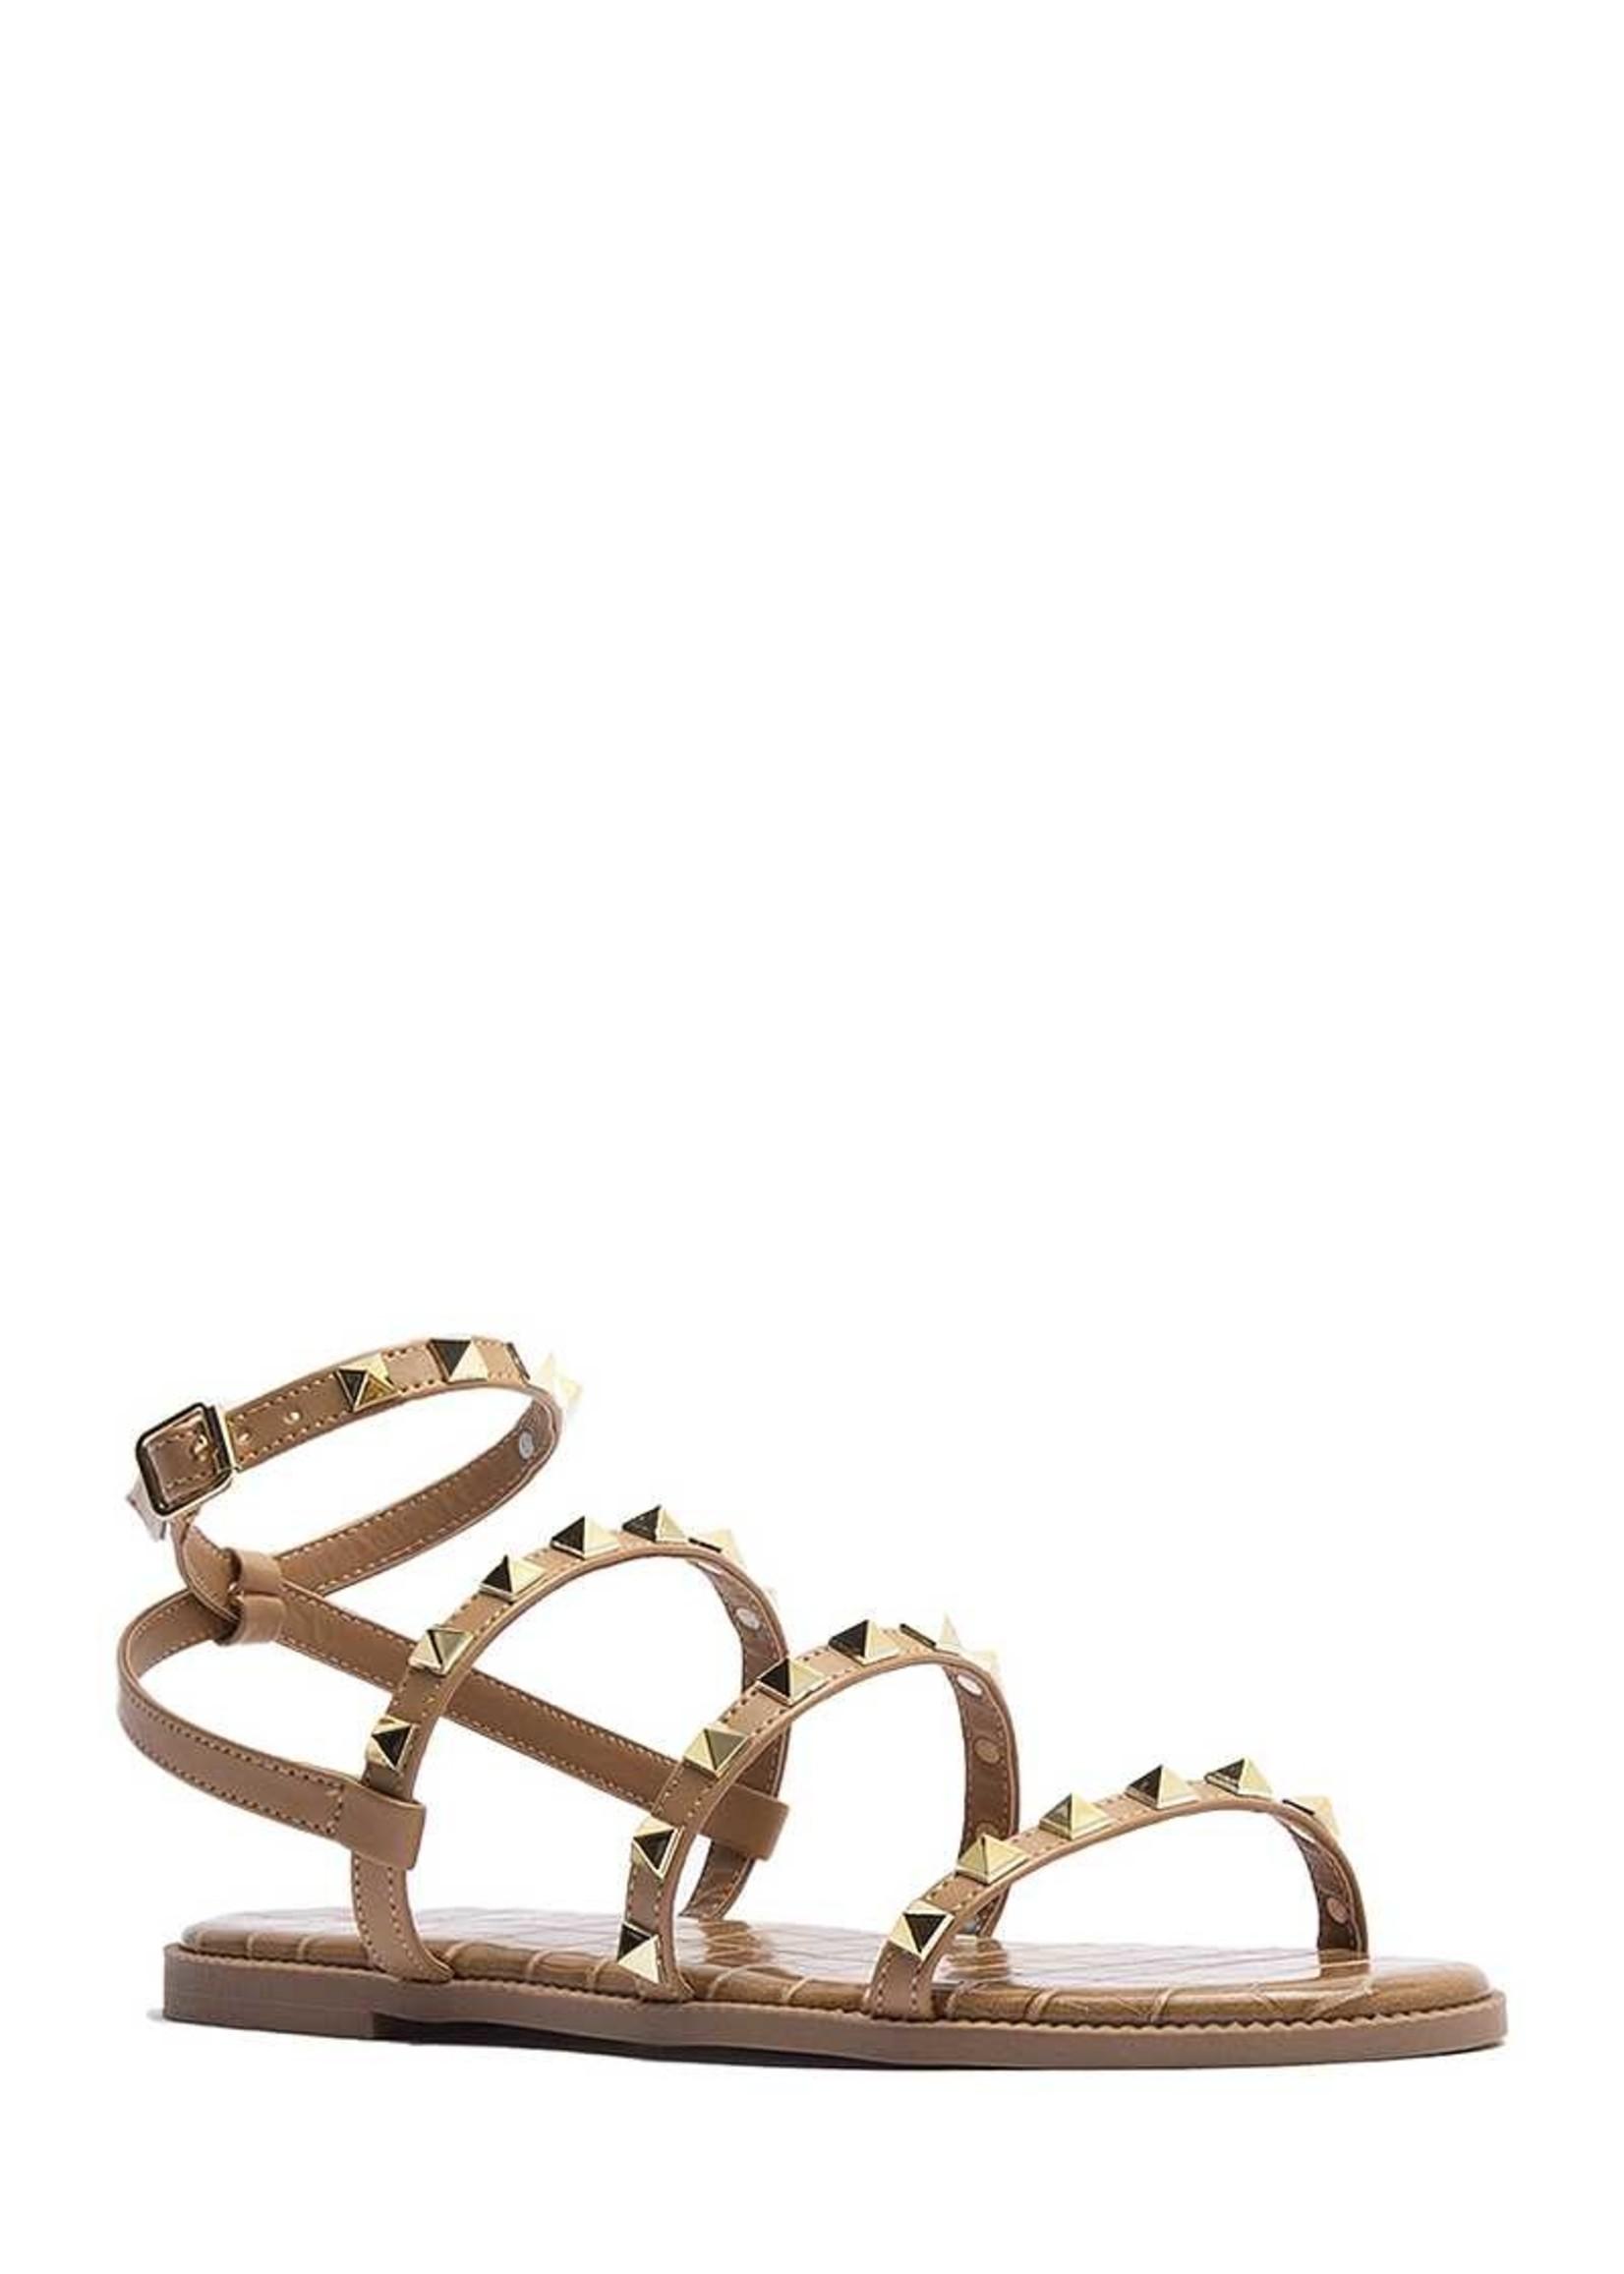 Studded wrap sandals